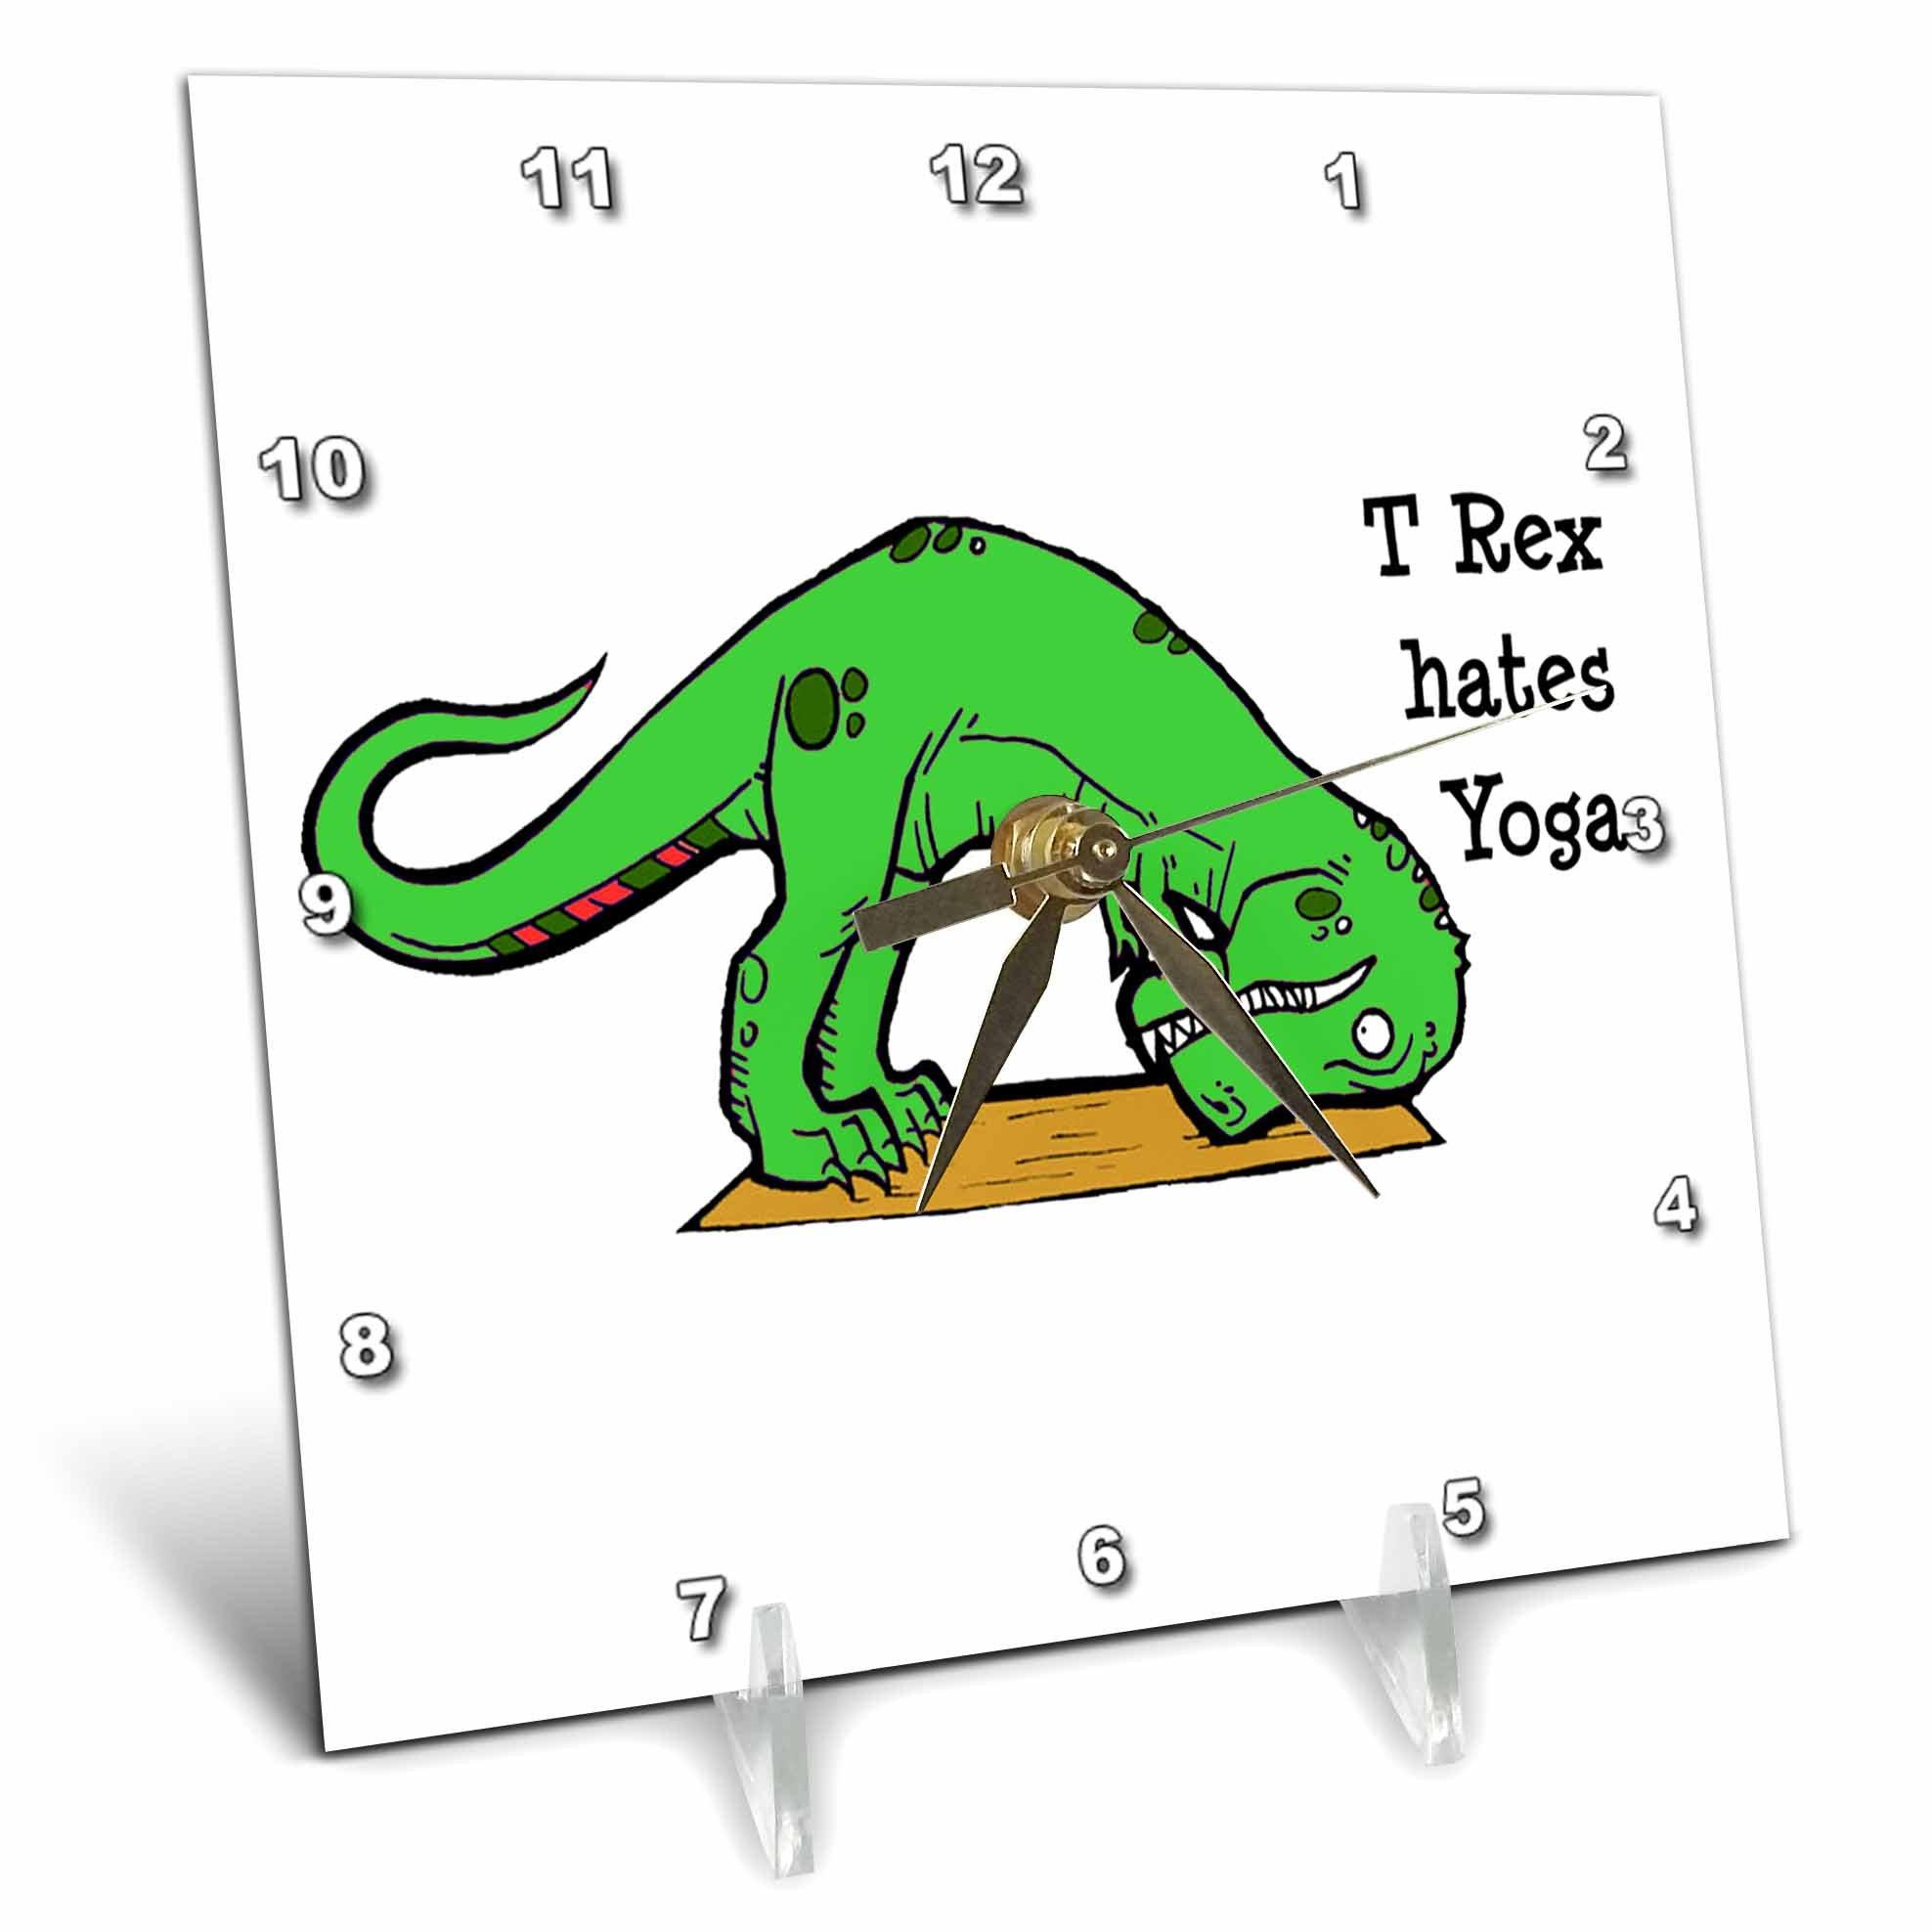 3dRose dc_193329_1 T Rex Hates Yoga, Desk Clock, 6 by 6''